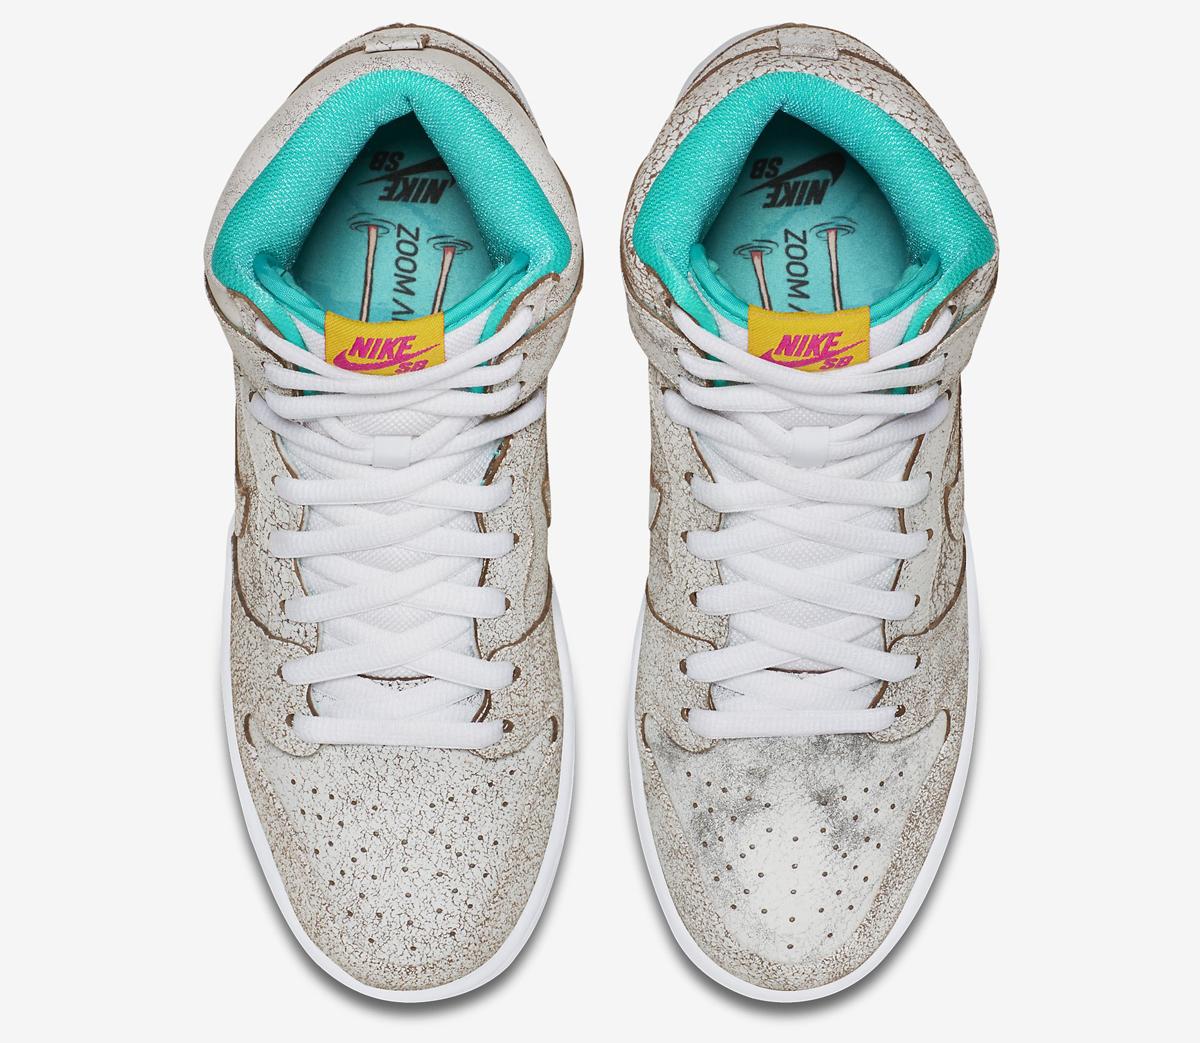 The Other Half of Nike SB's 'Flamingo